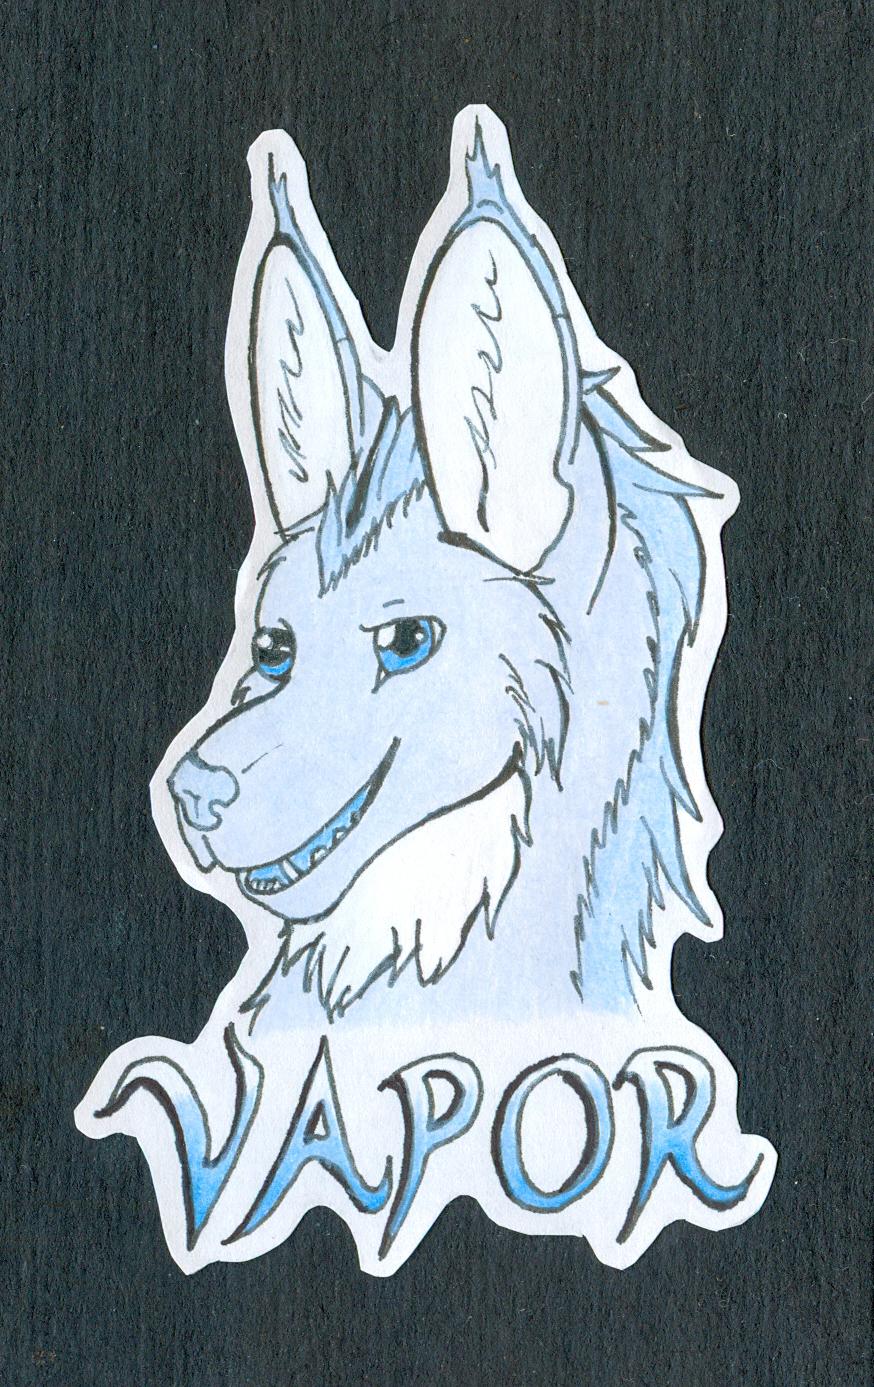 Vapor Badge